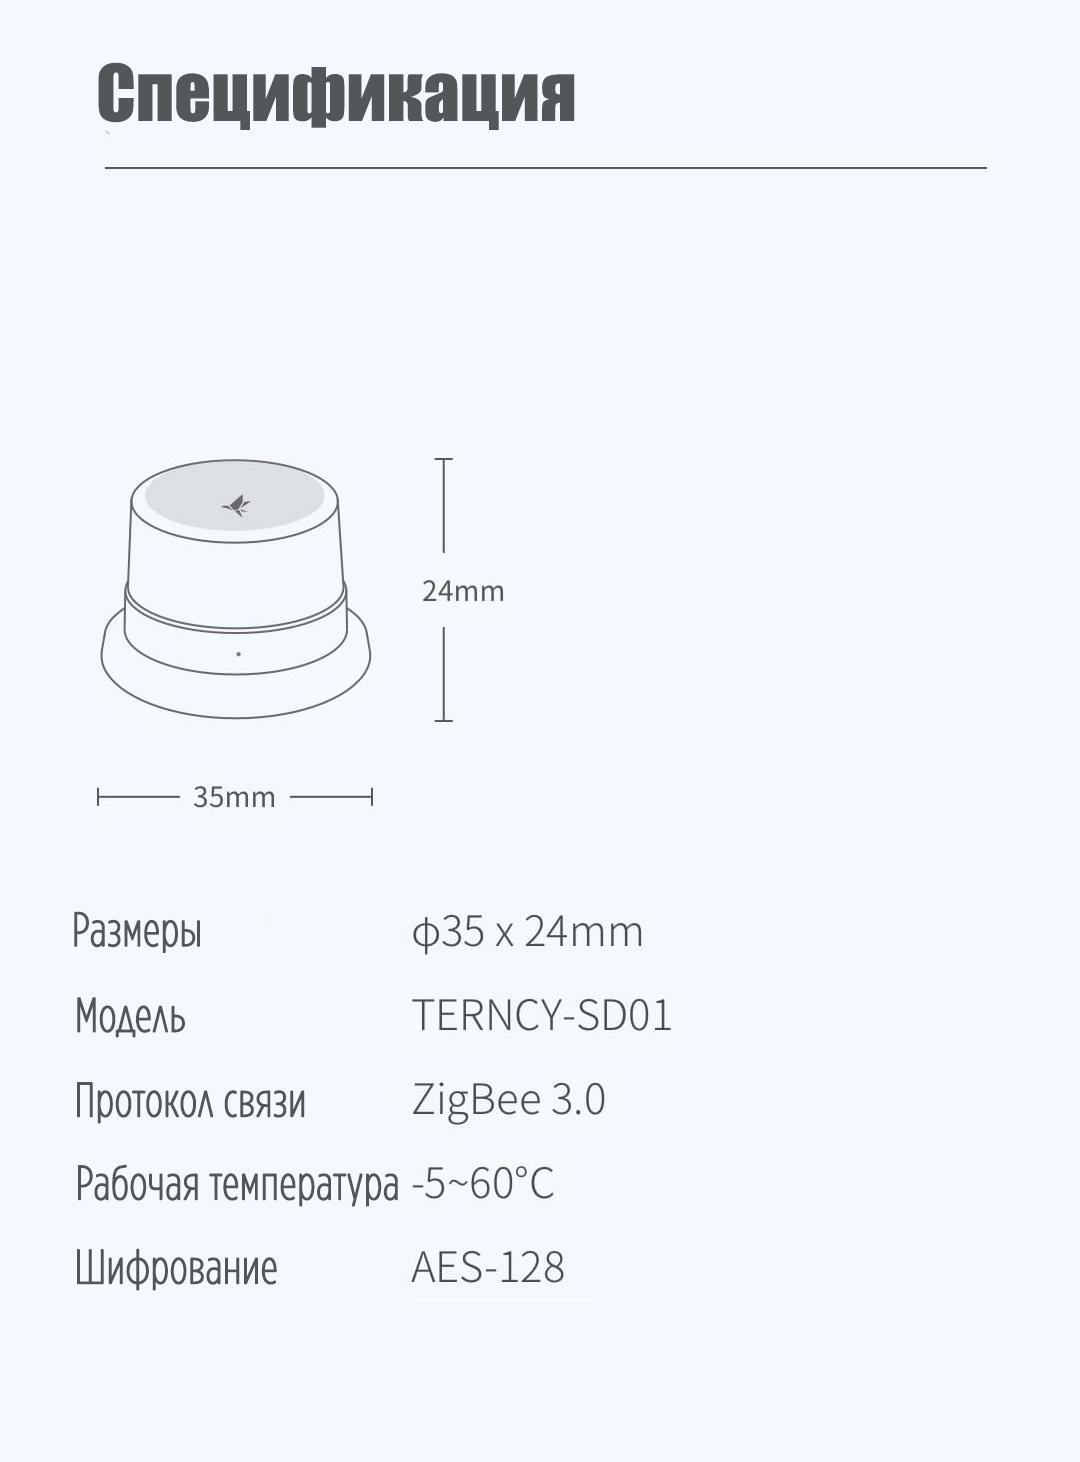 1600x_image.png?1591364667